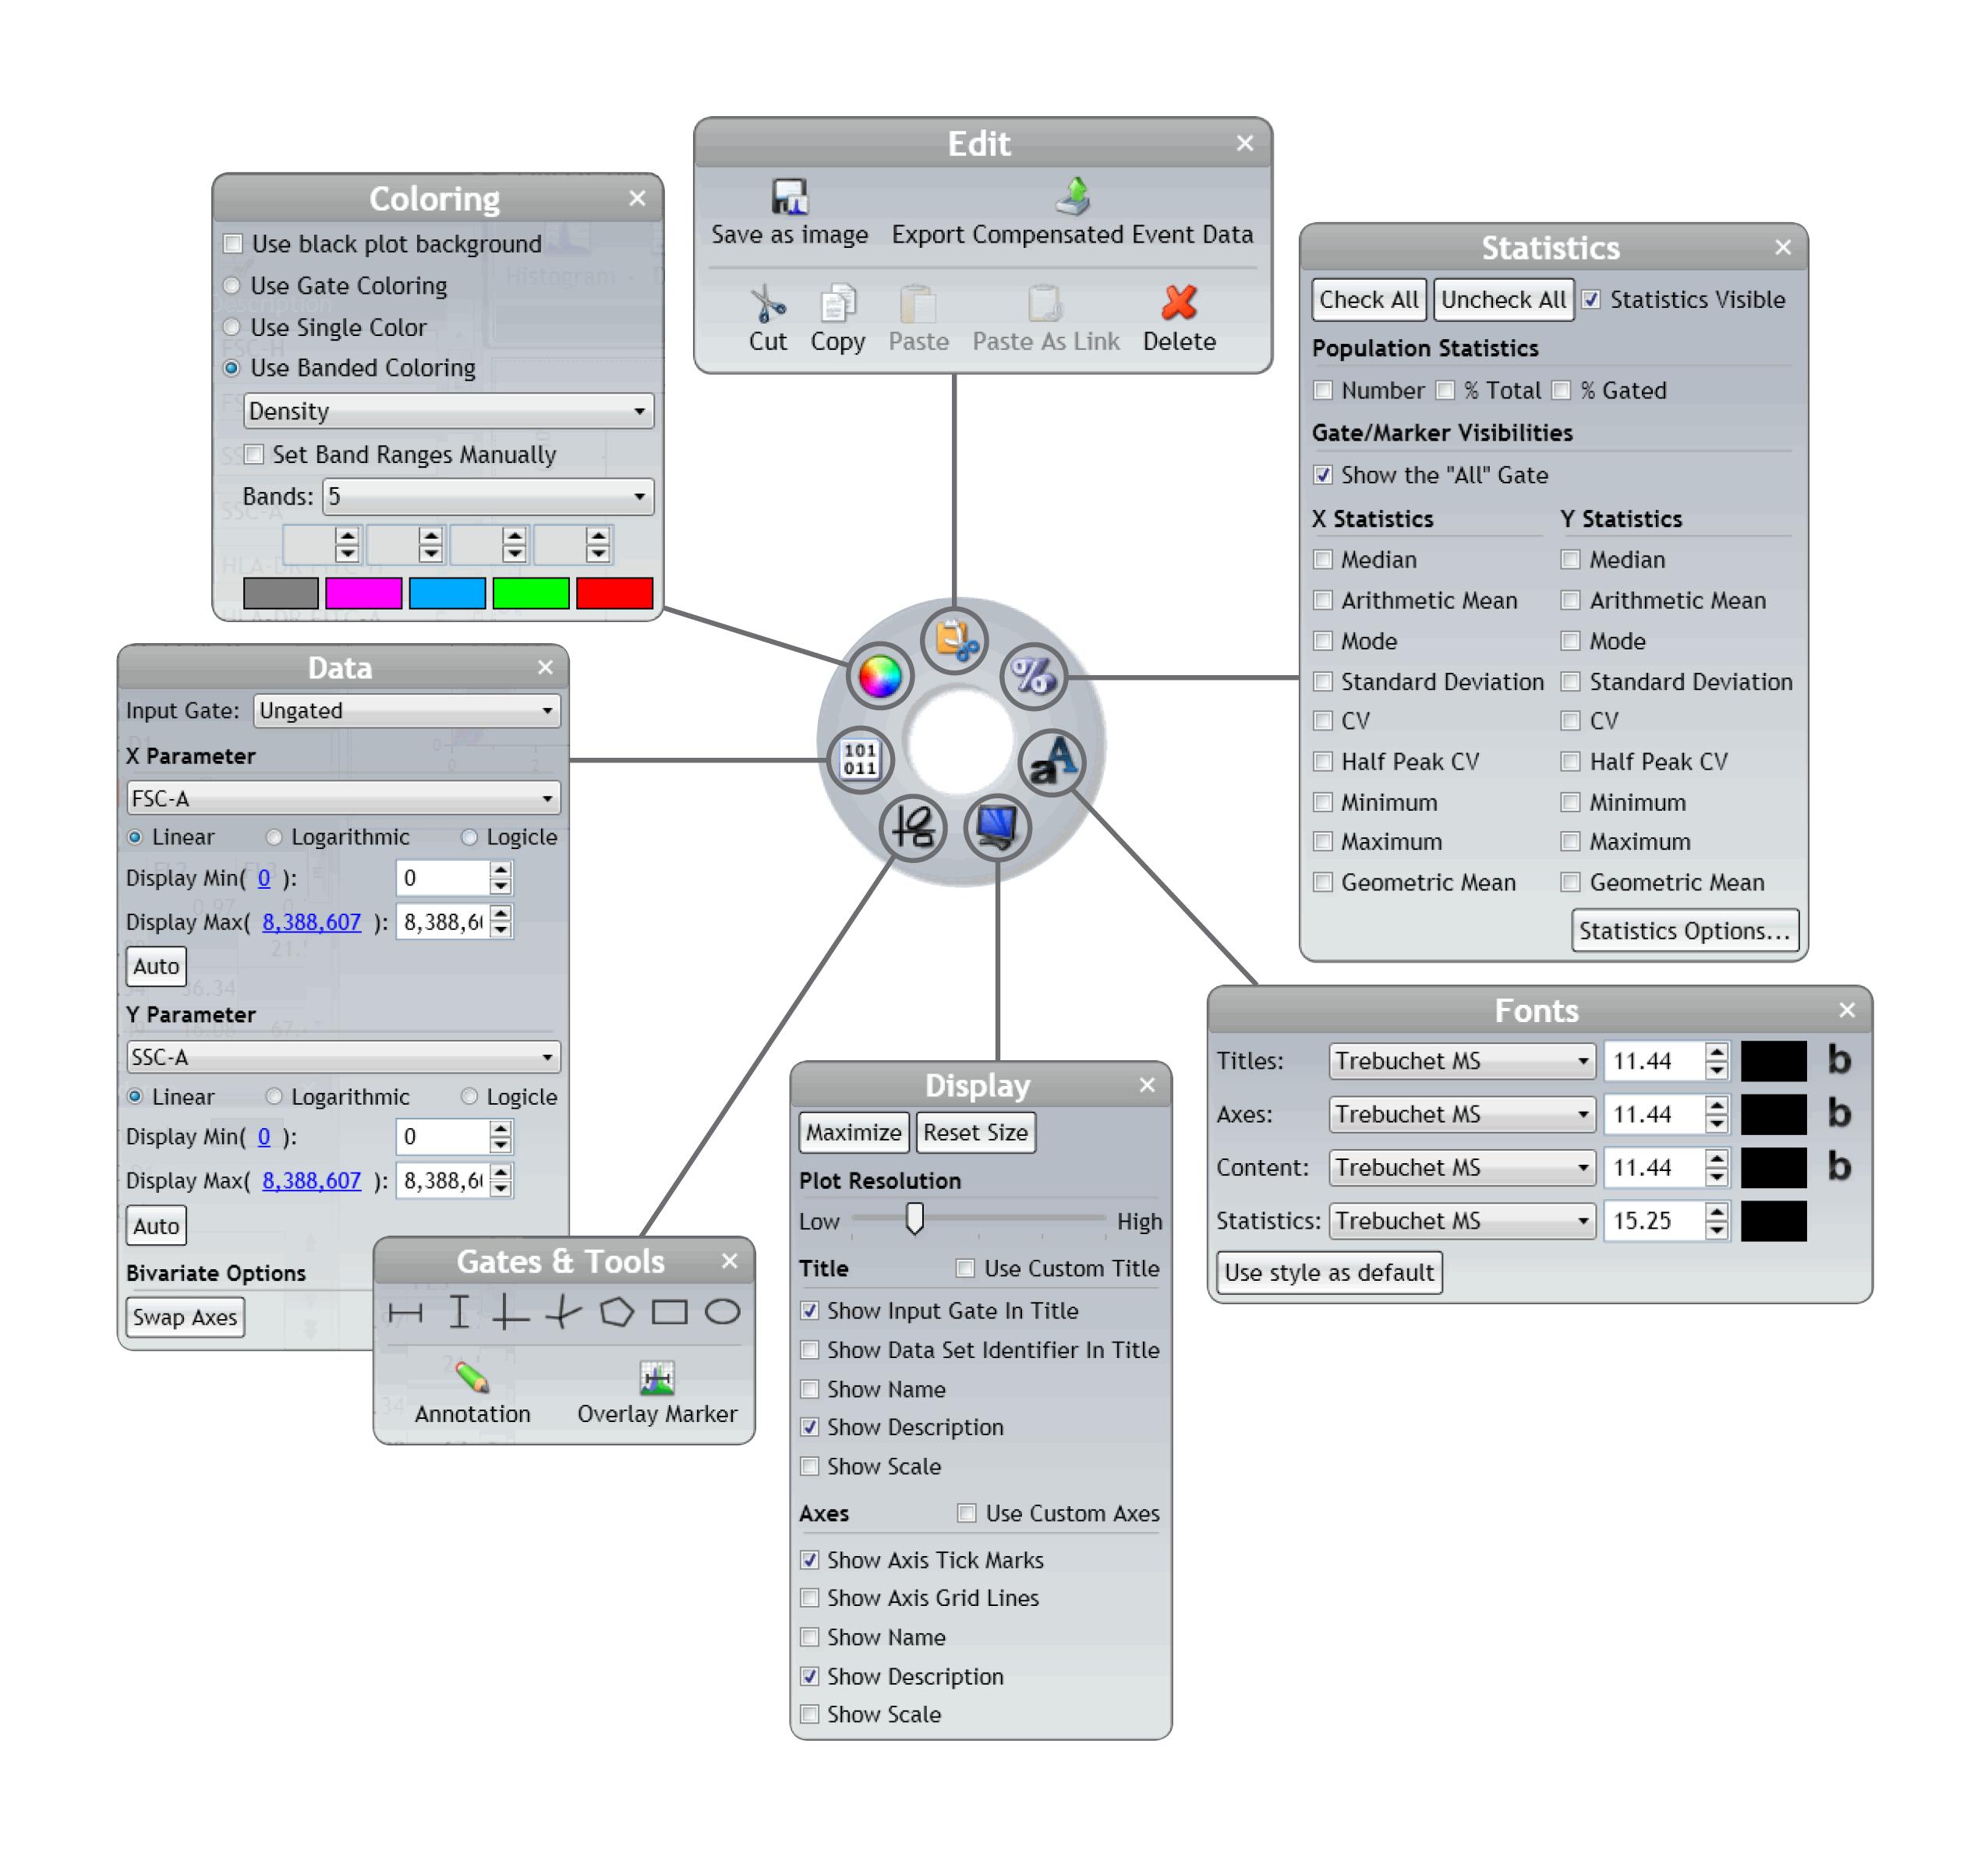 Kaluza Analysis Software context-specific radial menus